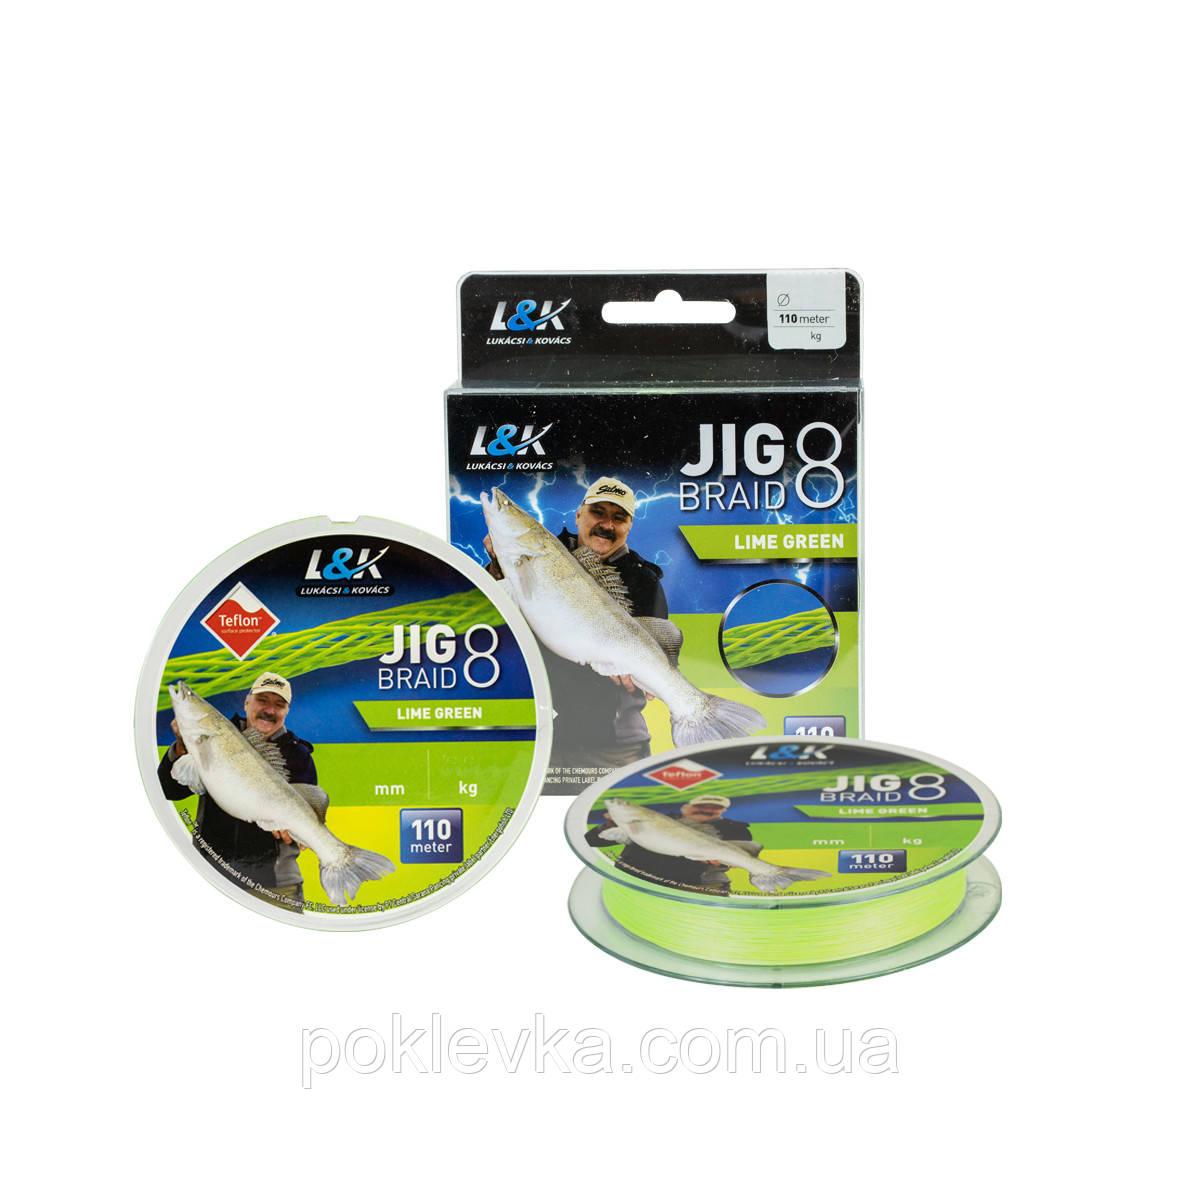 Шнур Energofish L&K X8 JIG BRAID 0,15мм 9.1кг 110м LIME GREEN